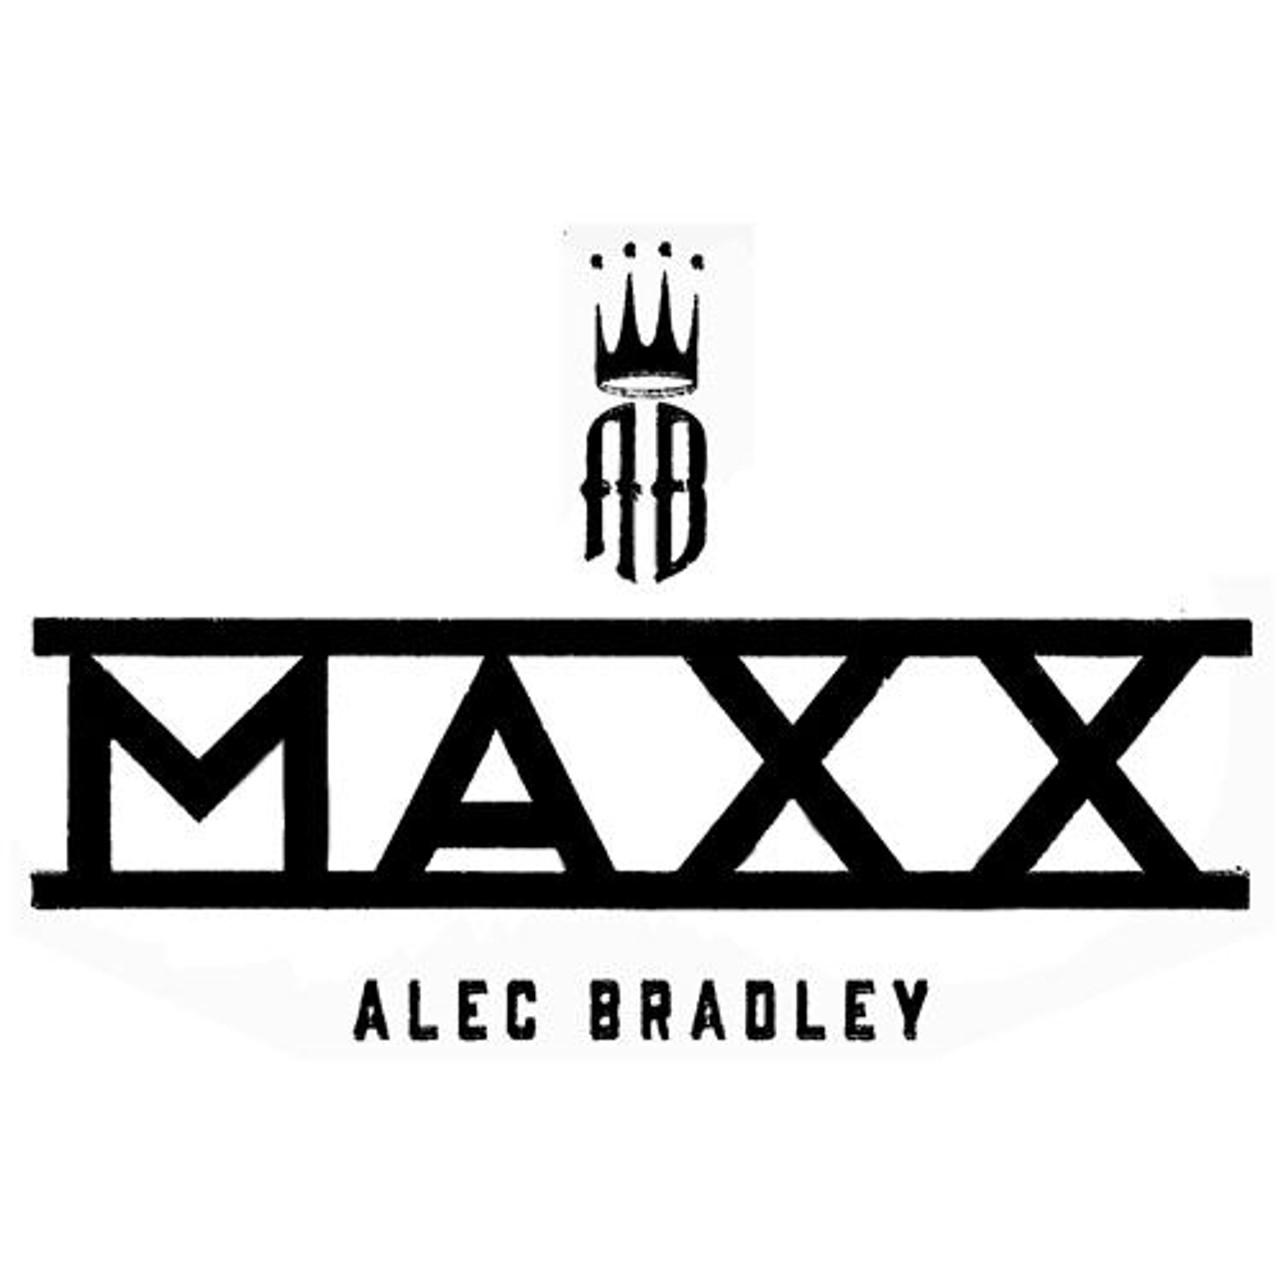 Alec Bradley MAXX Freak Logo